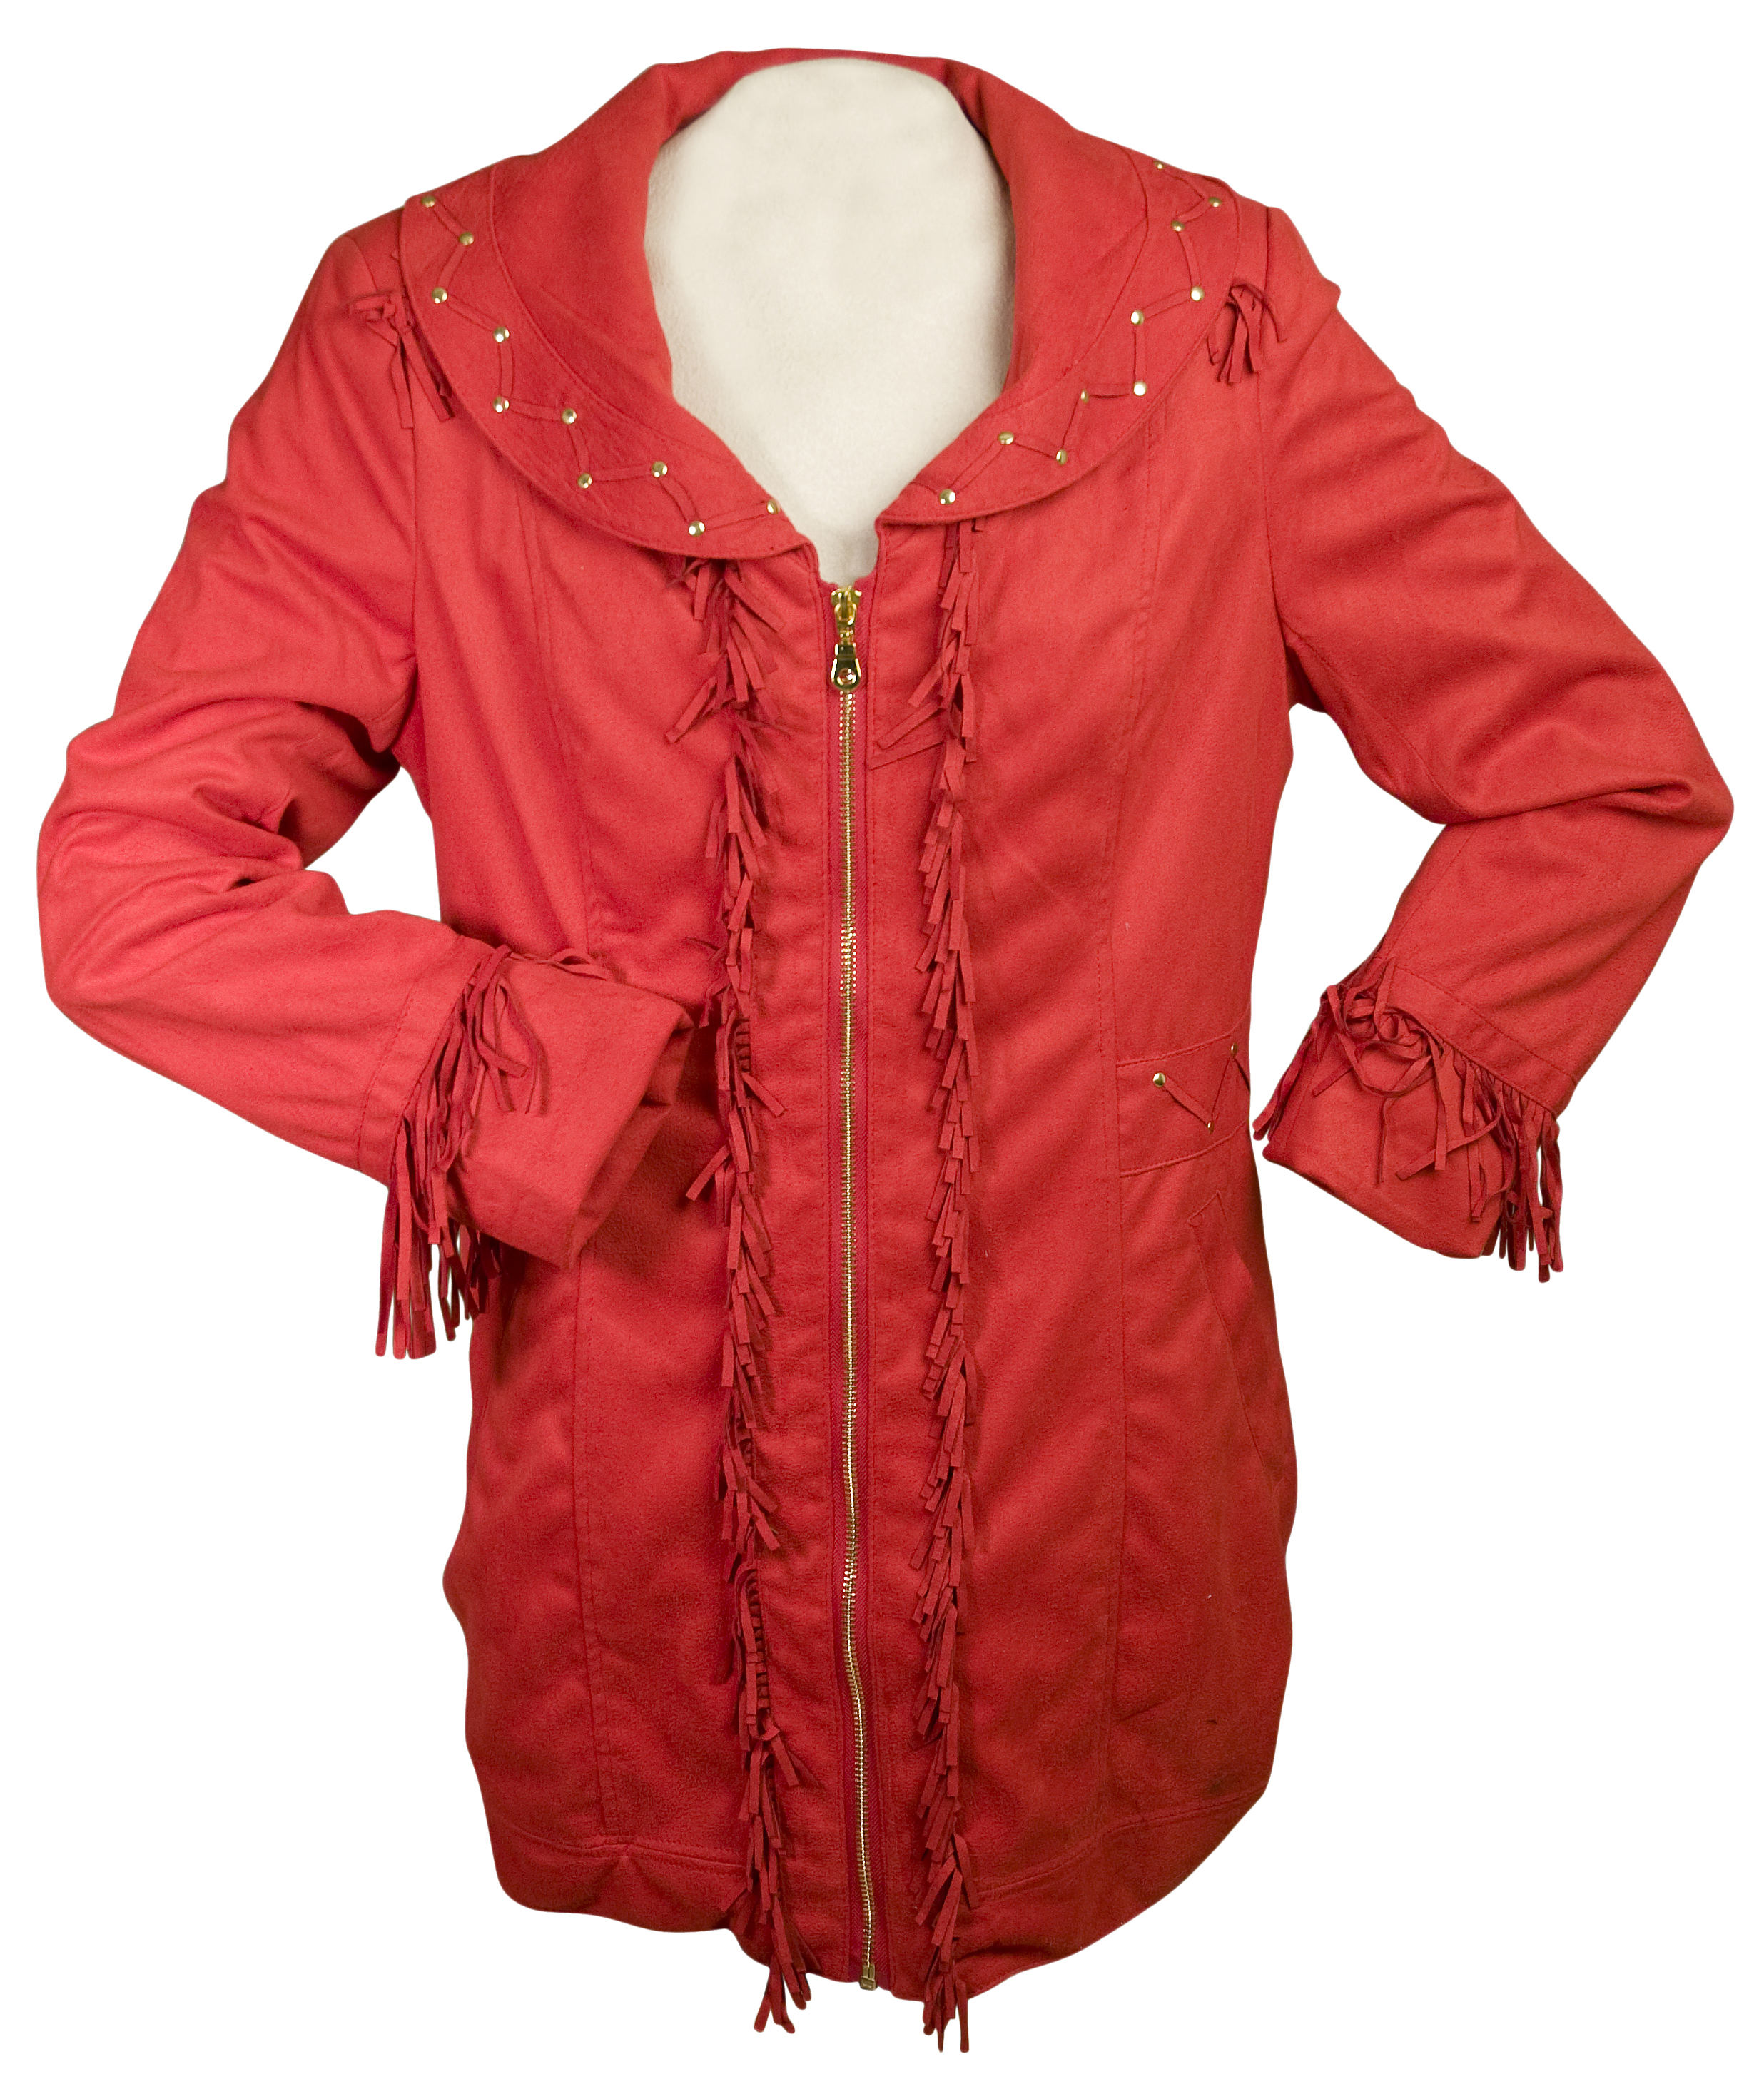 Western Suede Long Jacket with Fringe